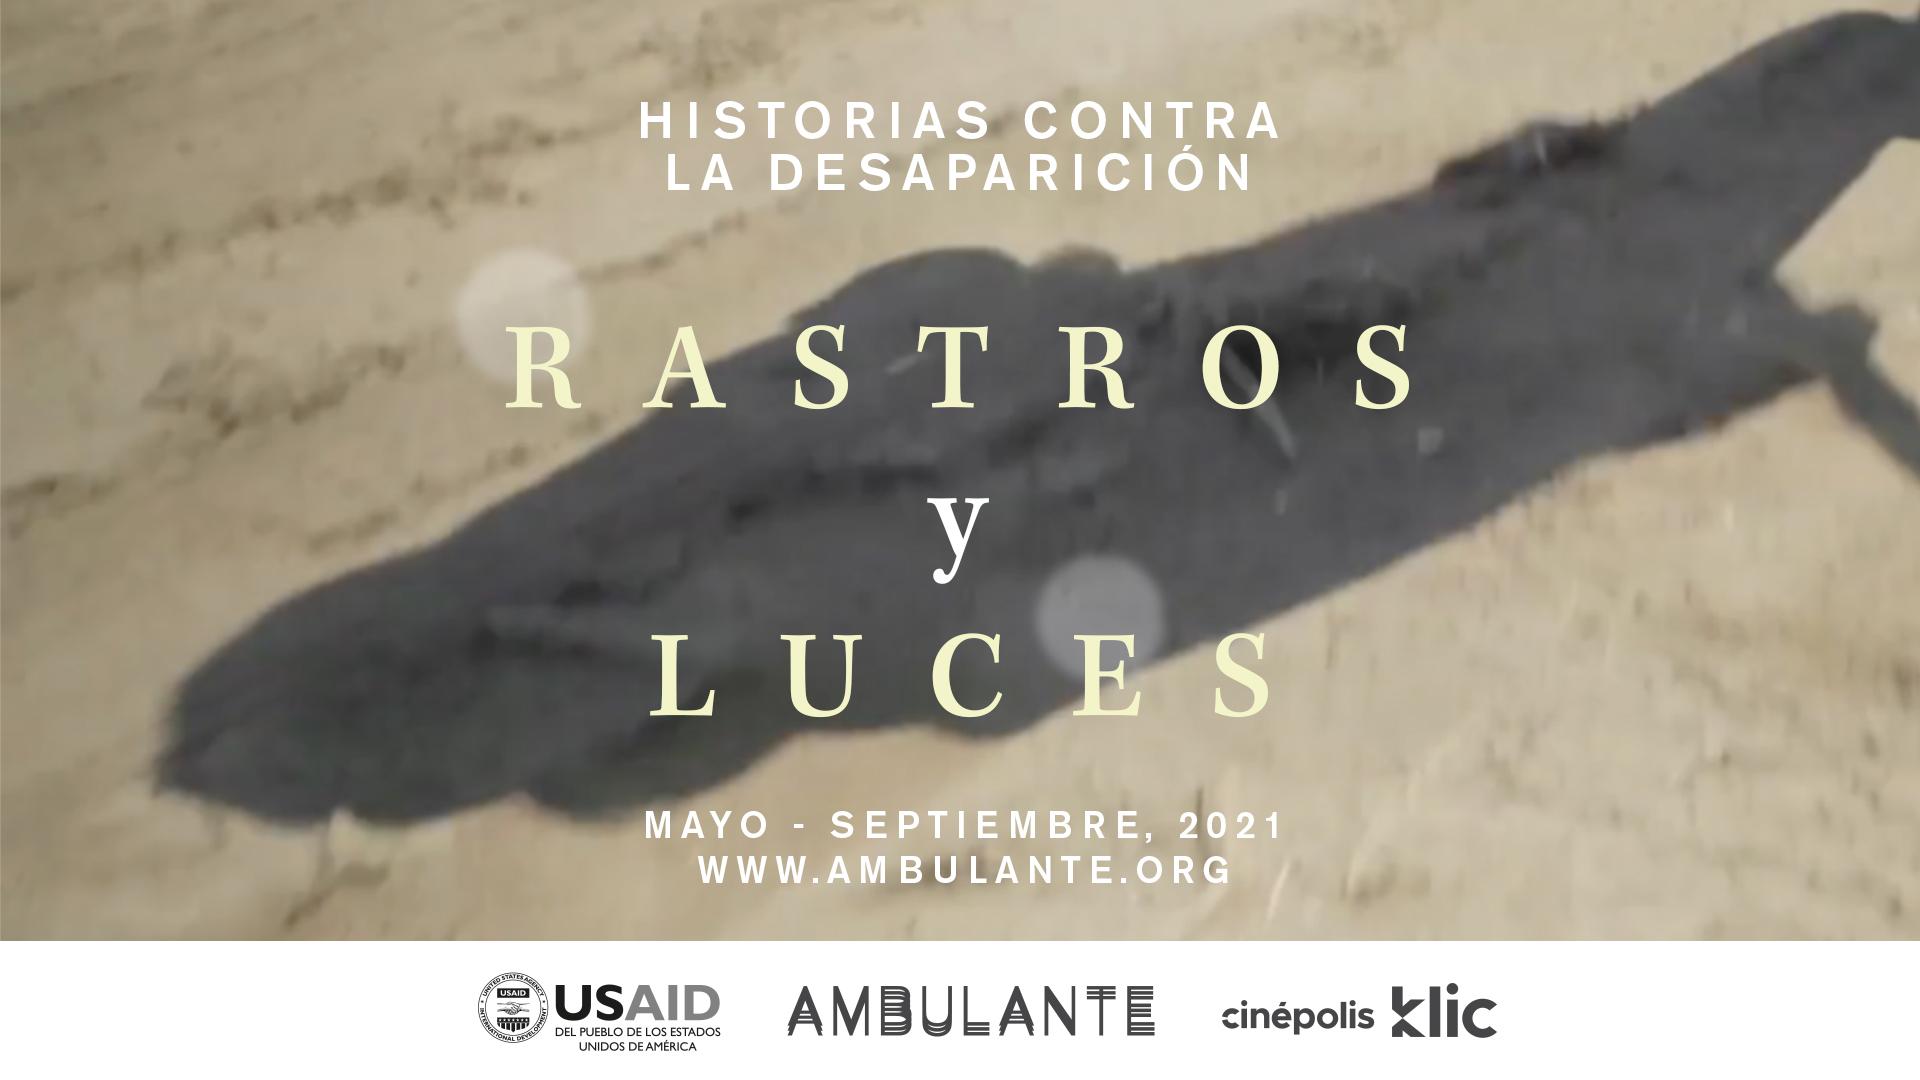 BANNER_RASTROS Y LUCES (2) - Ambulante